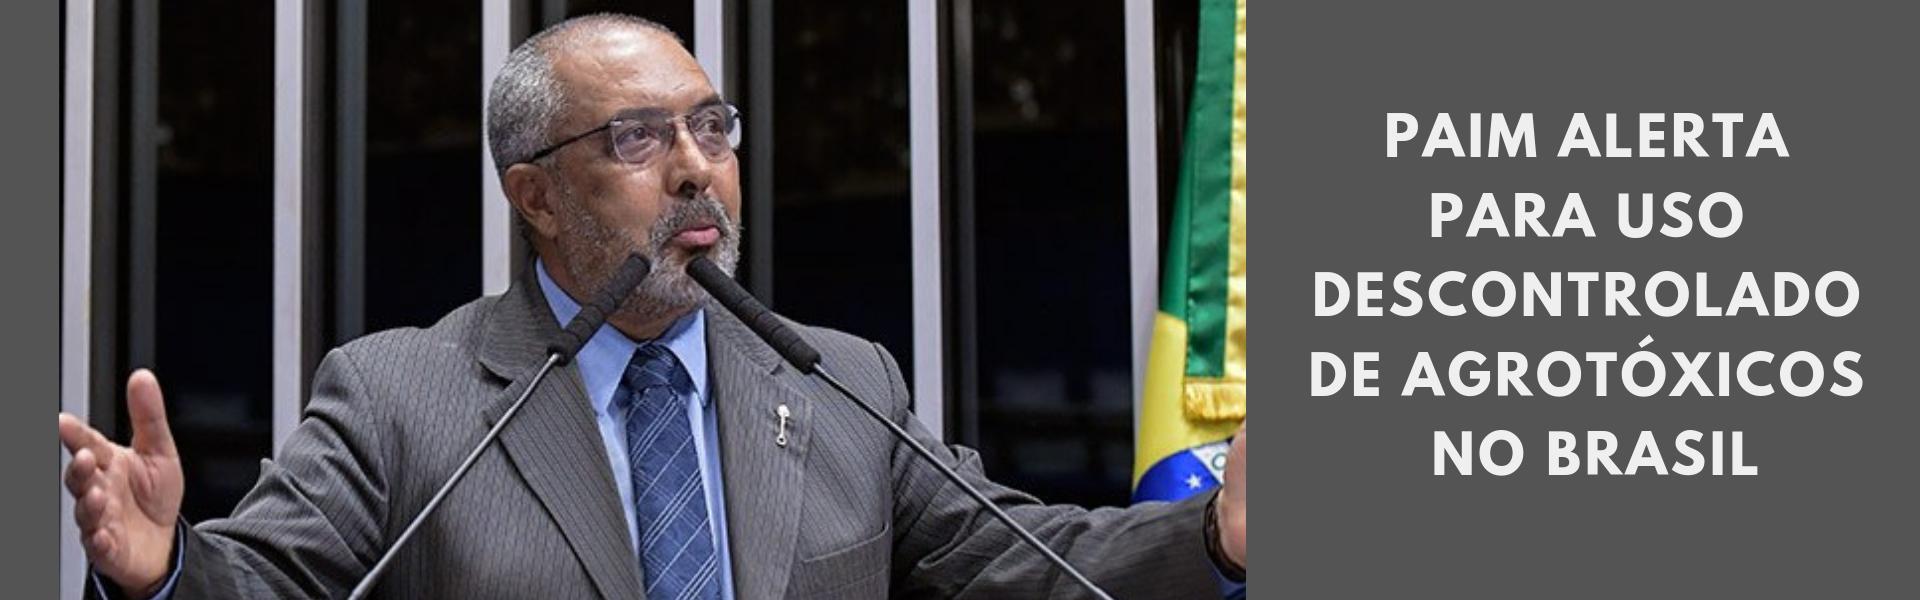 Paim alerta para uso descontrolado de agrotóxicos no Brasil